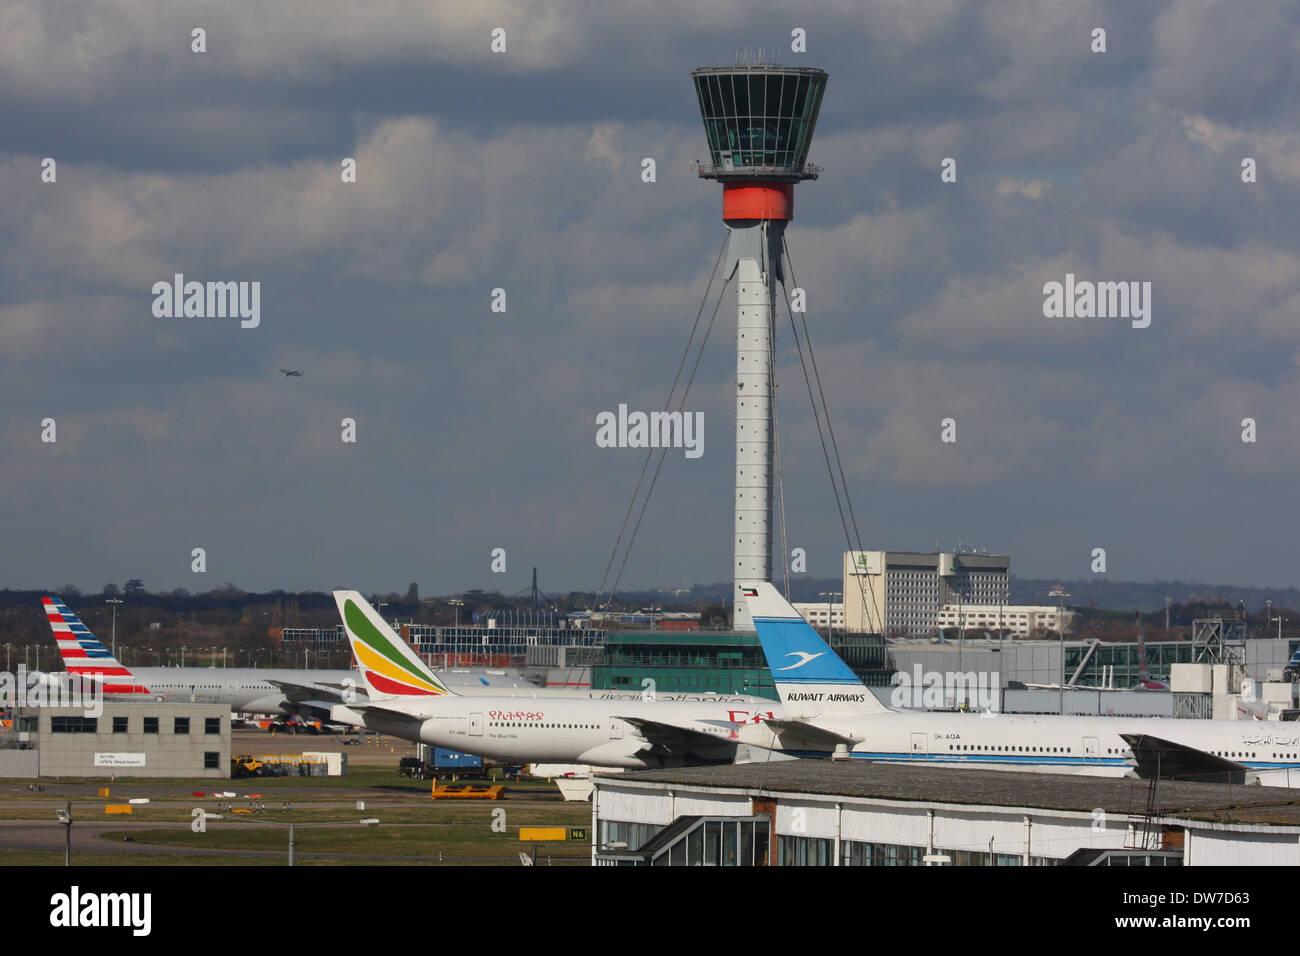 HEATHROW AIRPORT LONDON LHR - Stock Image